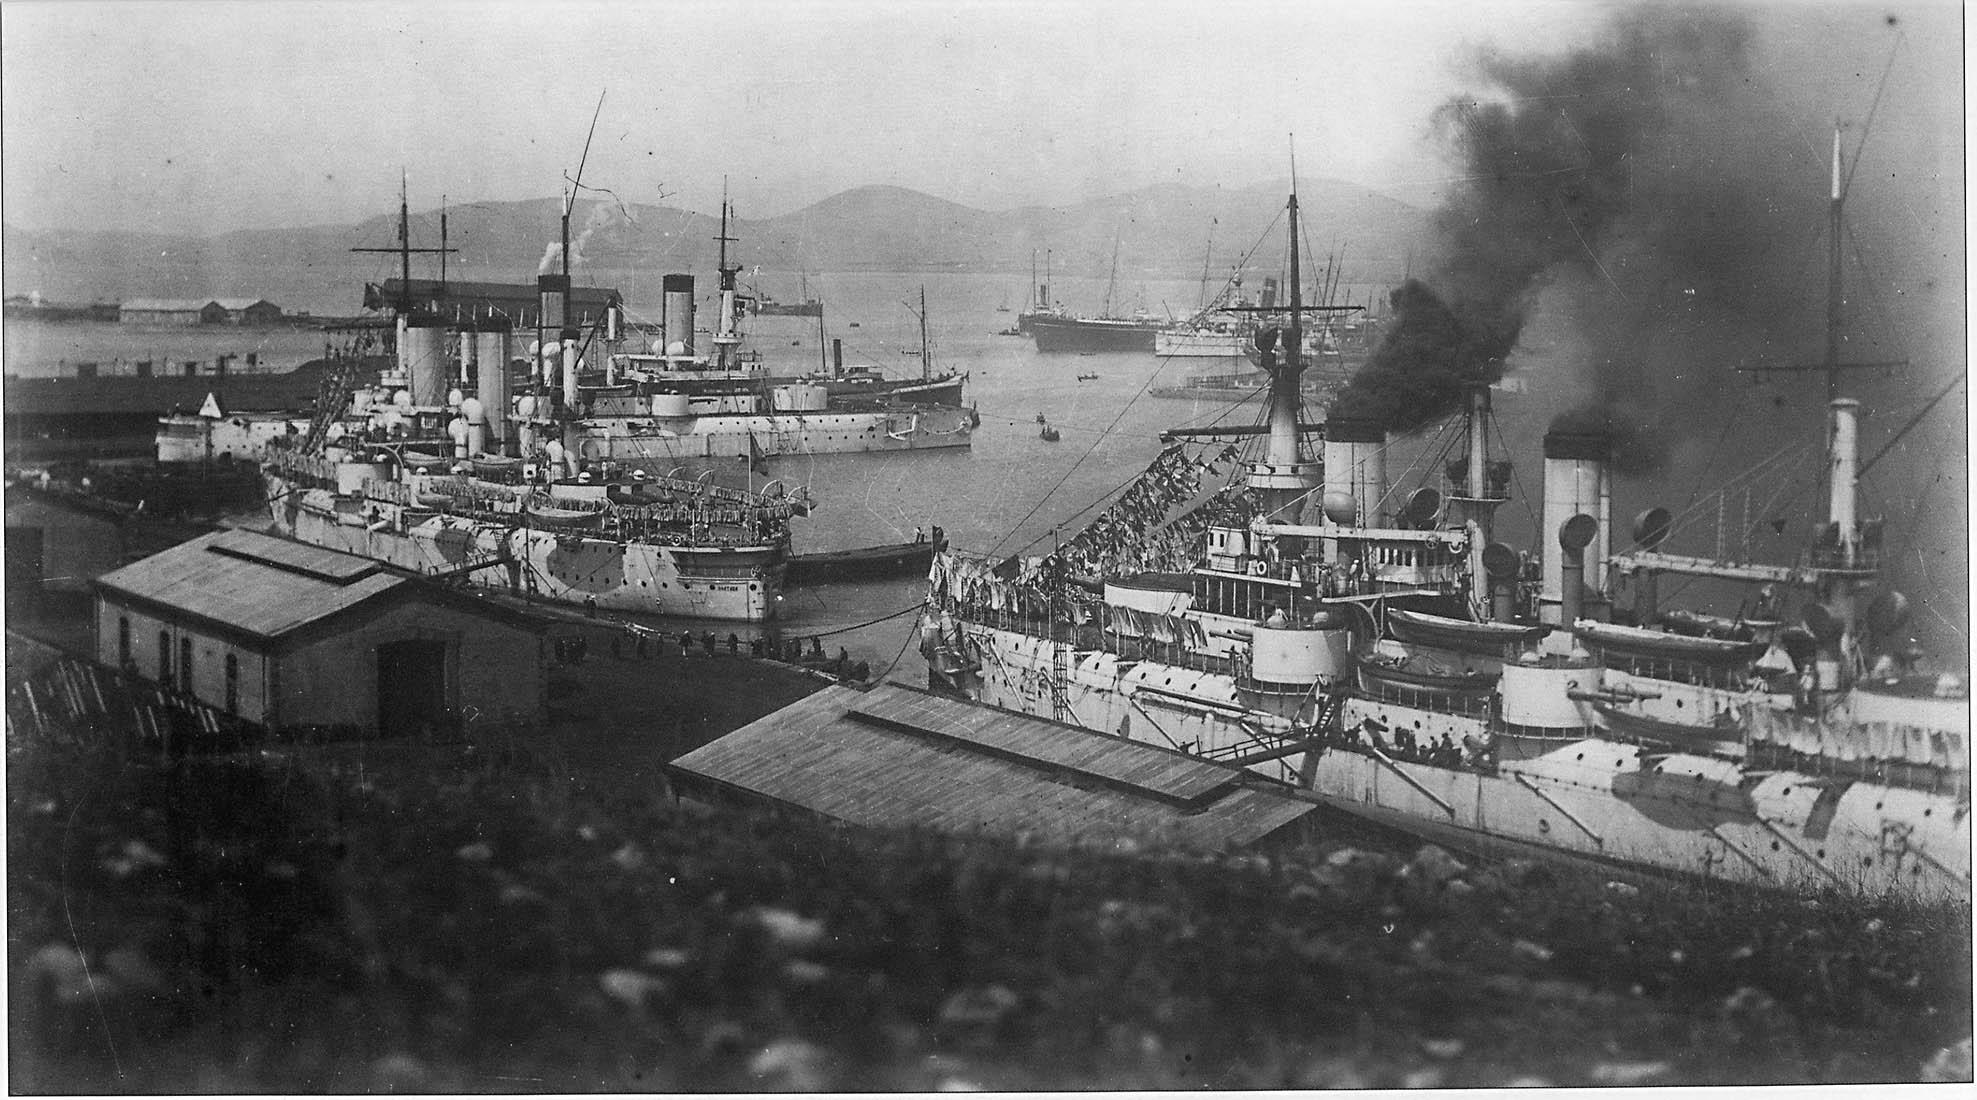 Pre-Revolution Russia In Photos. Russian Pacific Fleet Of 1898 - 1905